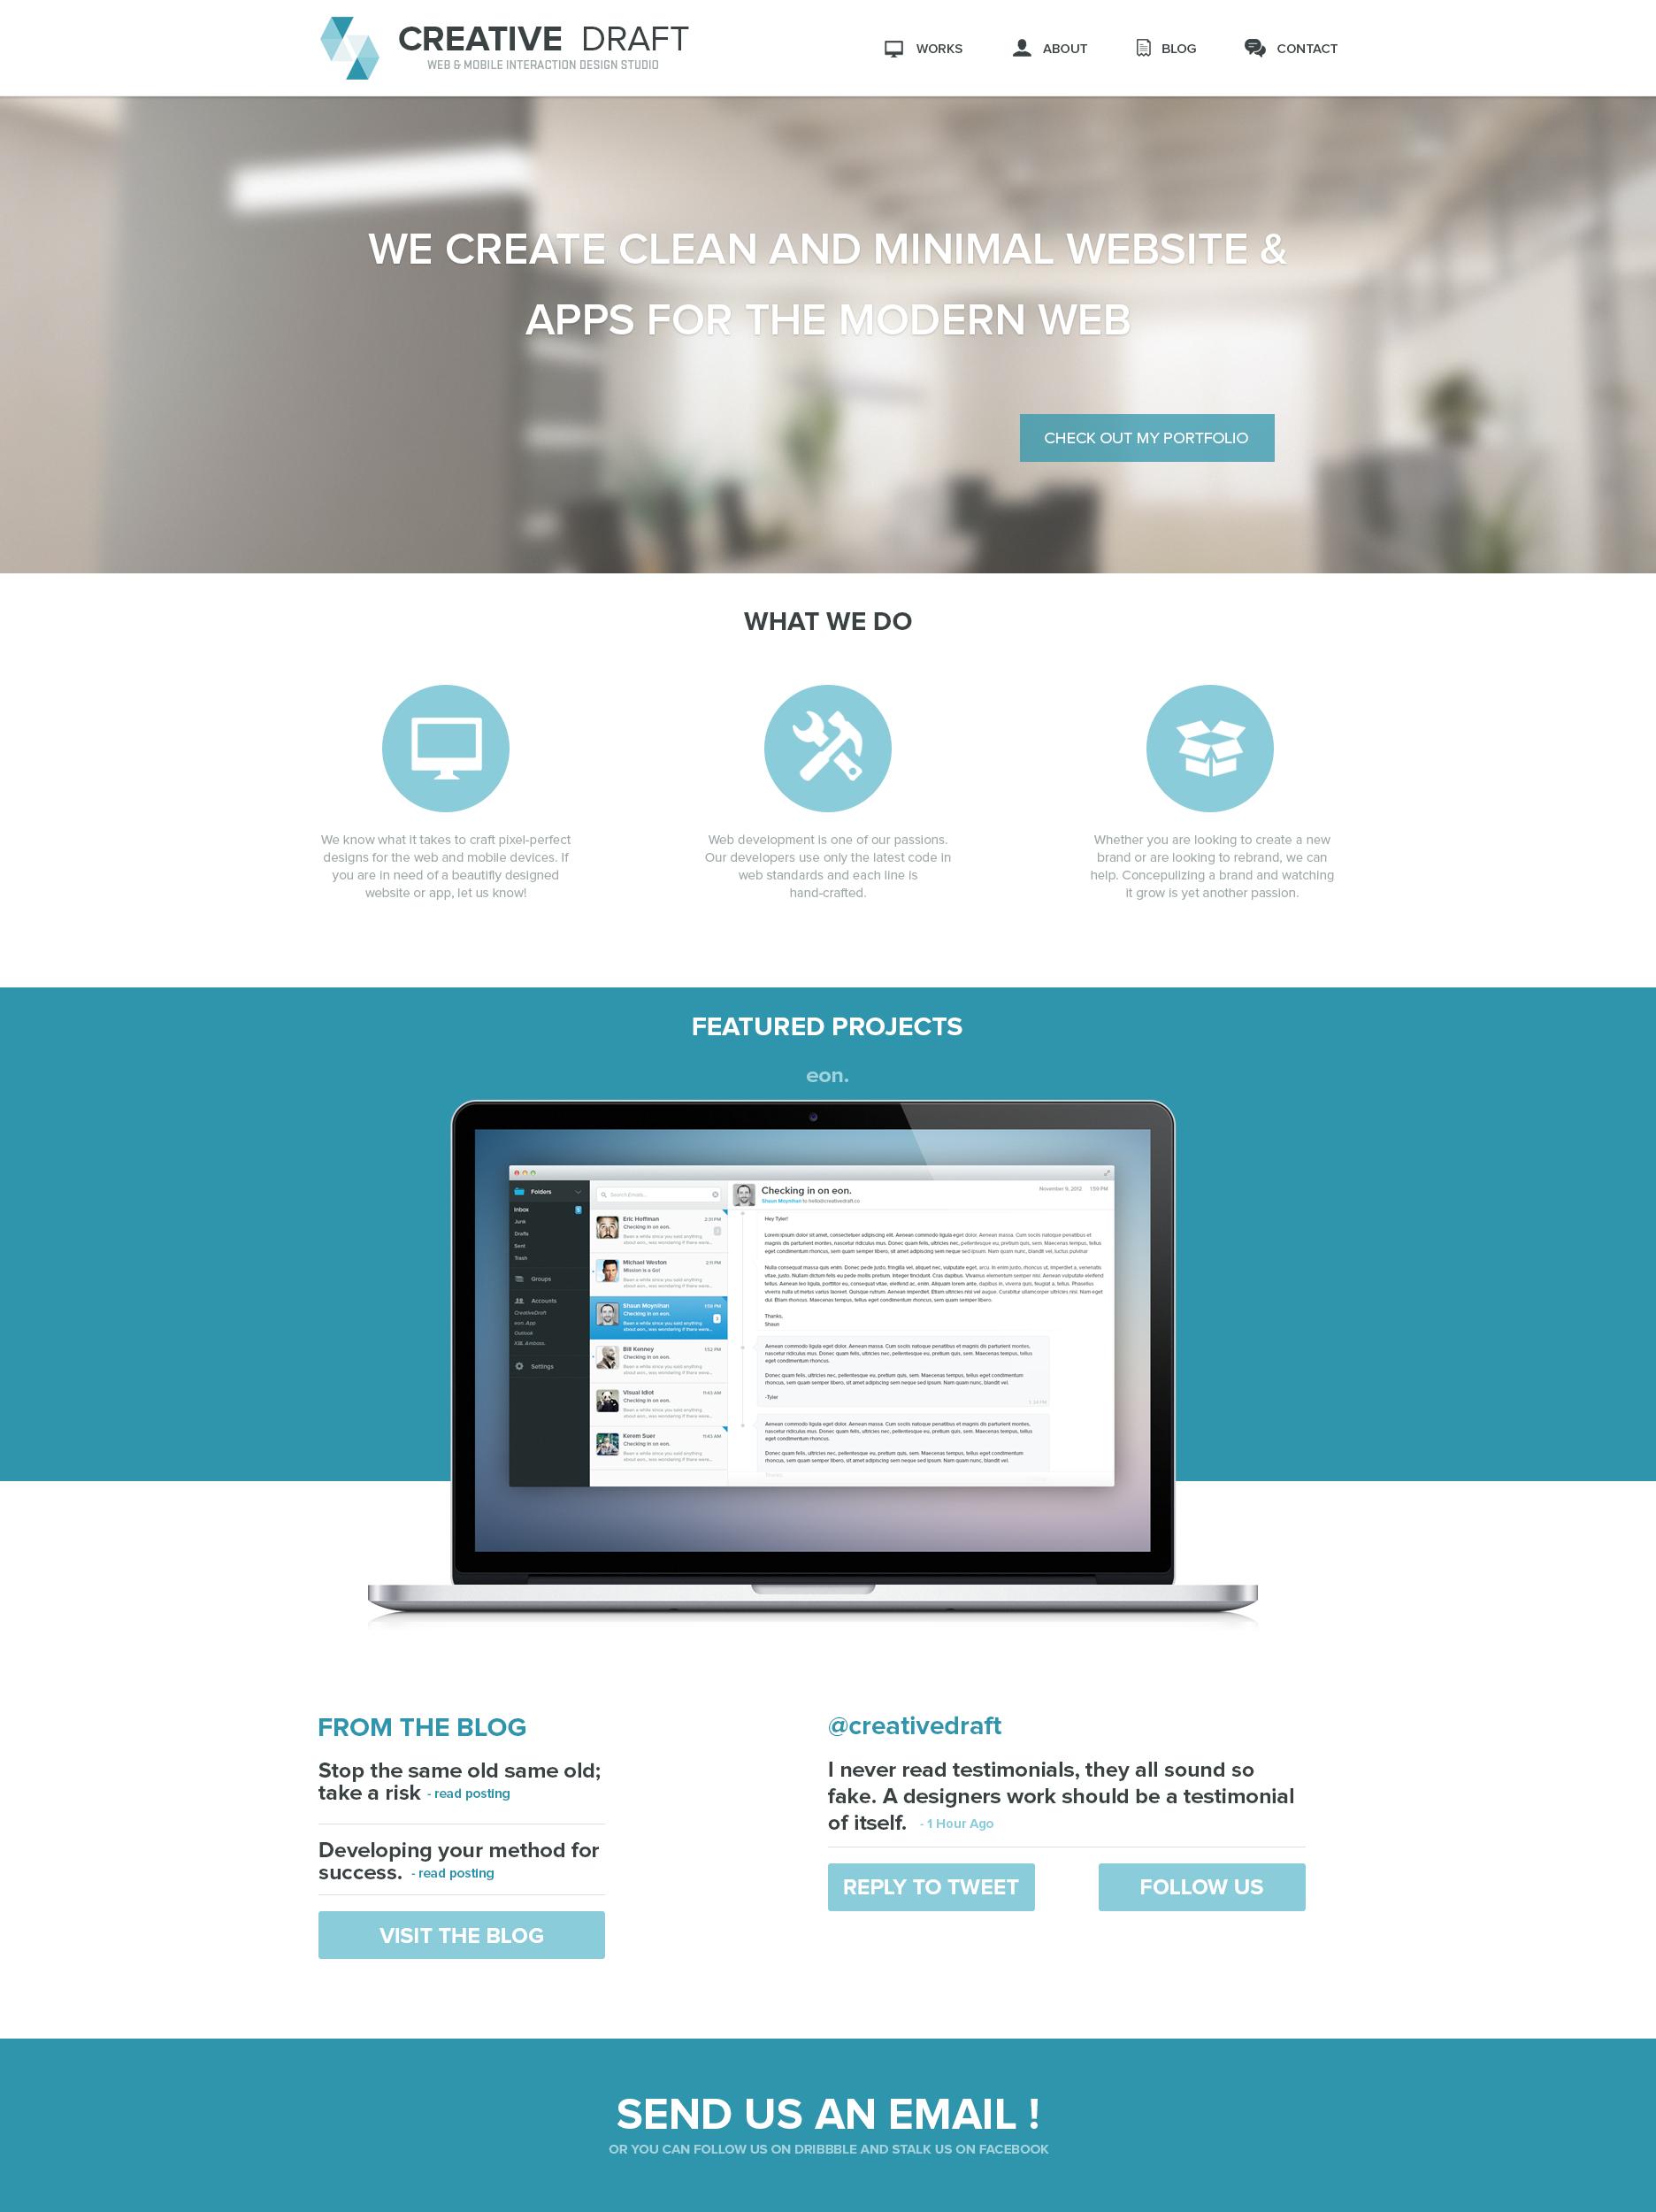 15 Beautiful Examples Of Web Design Inspiration Part 3 Web Design Web Design Inspiration Design Inspiration